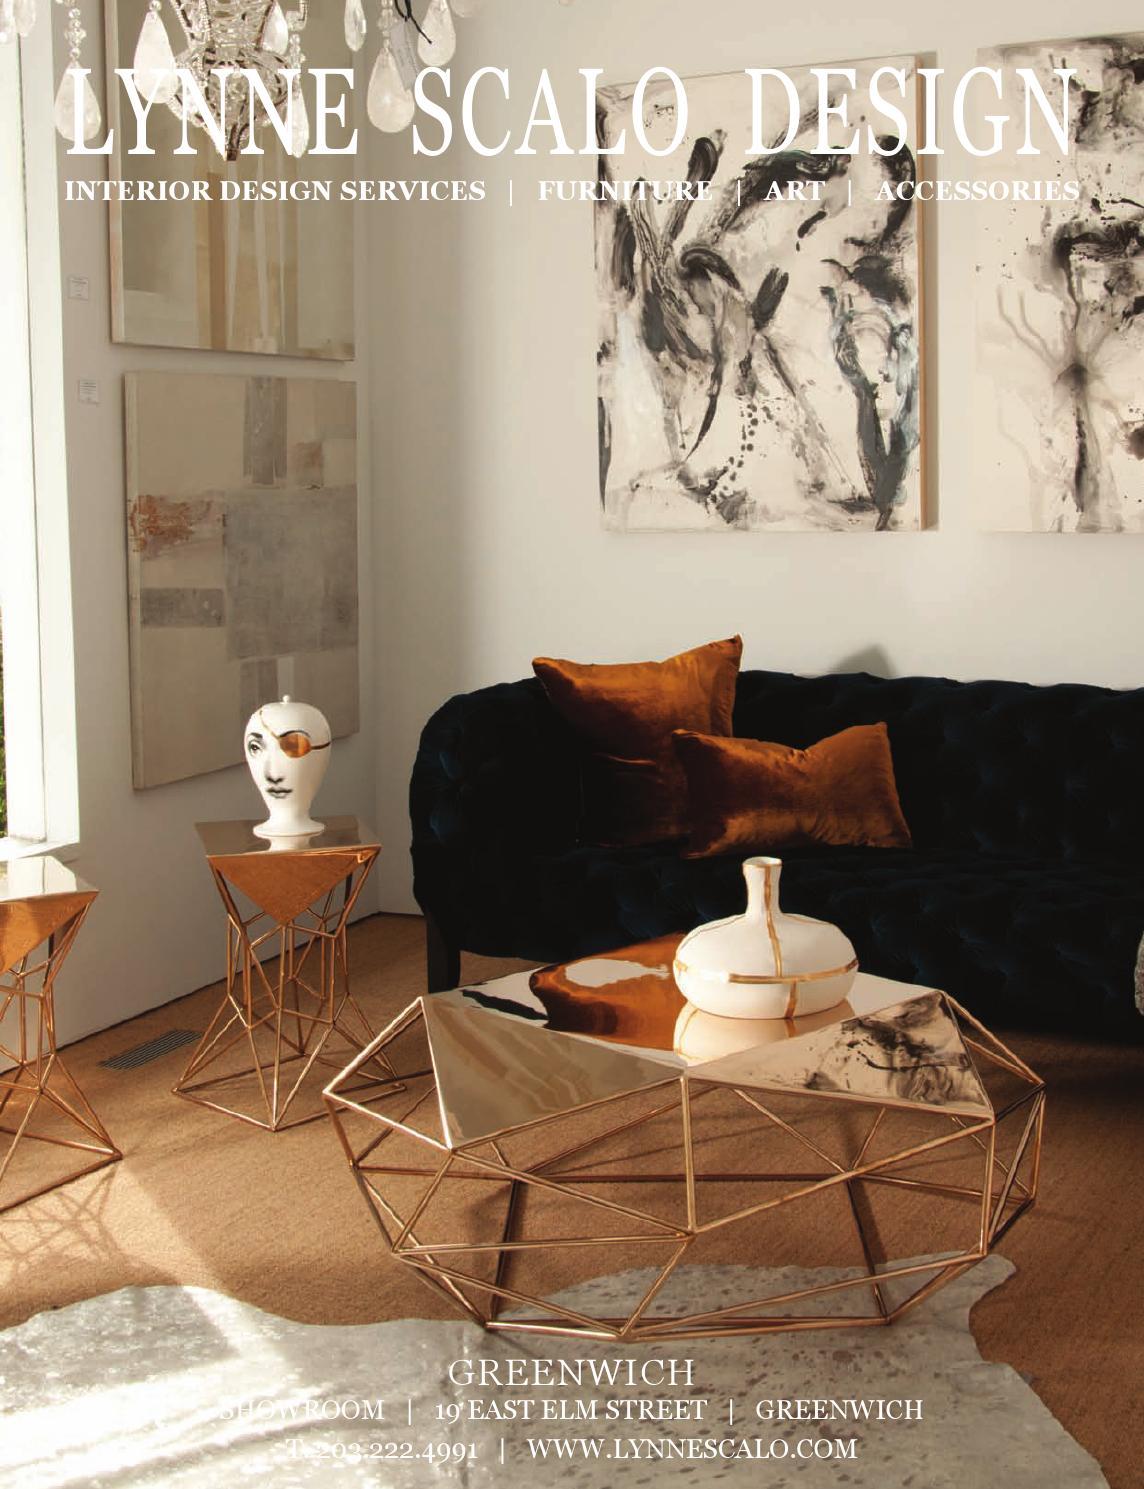 East coast home design march 2015 by east coast home publishing issuu